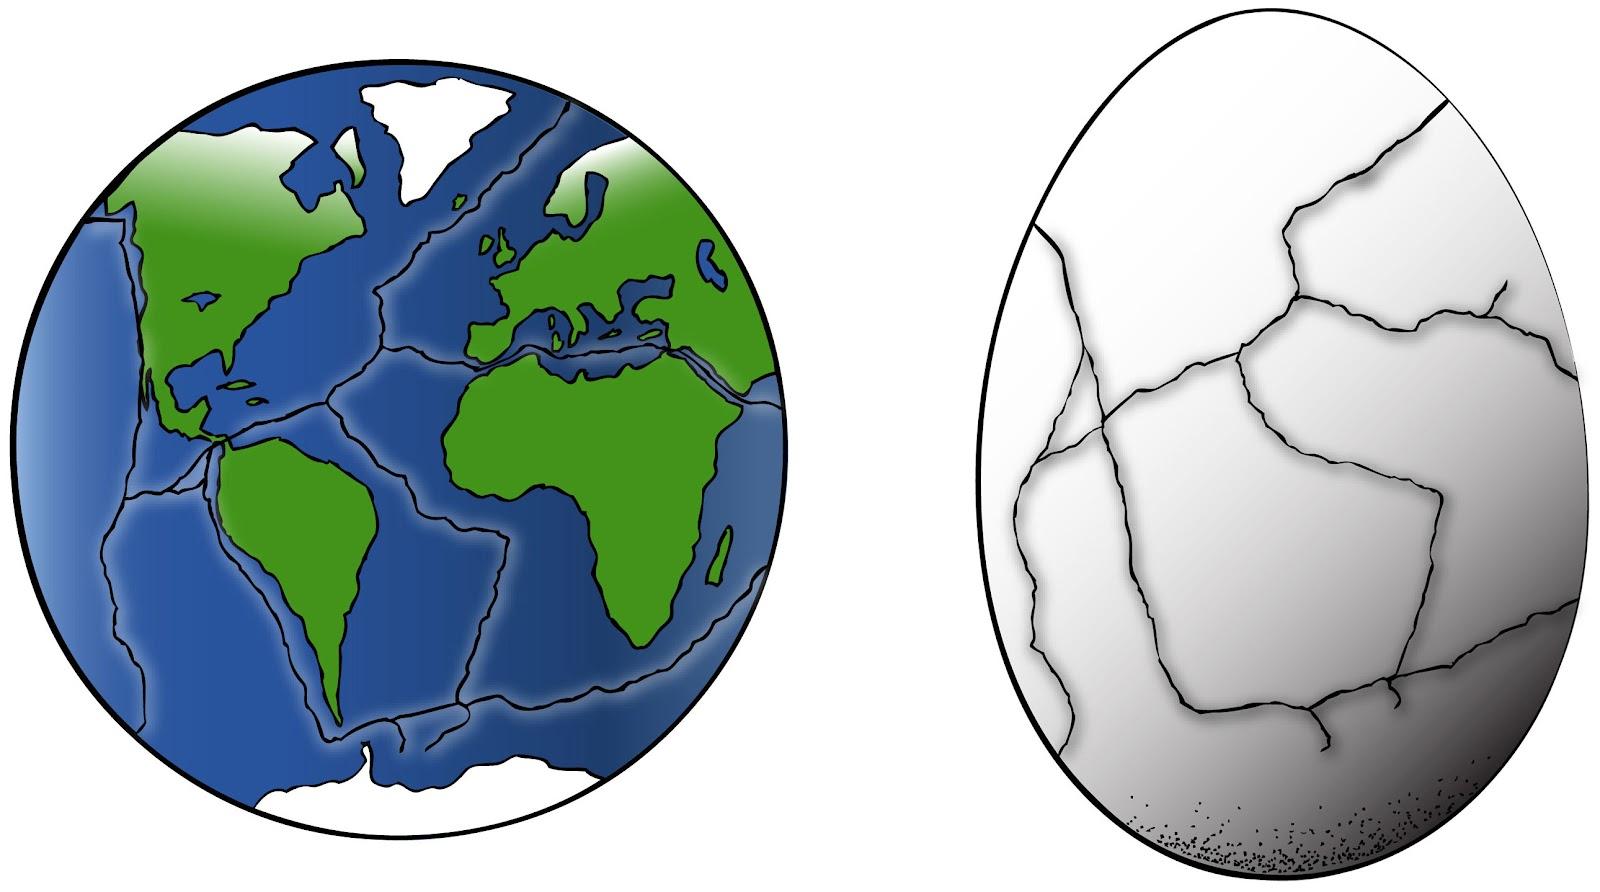 Myp Ii Grade 7 Science Blog Link To Plate Tectonic